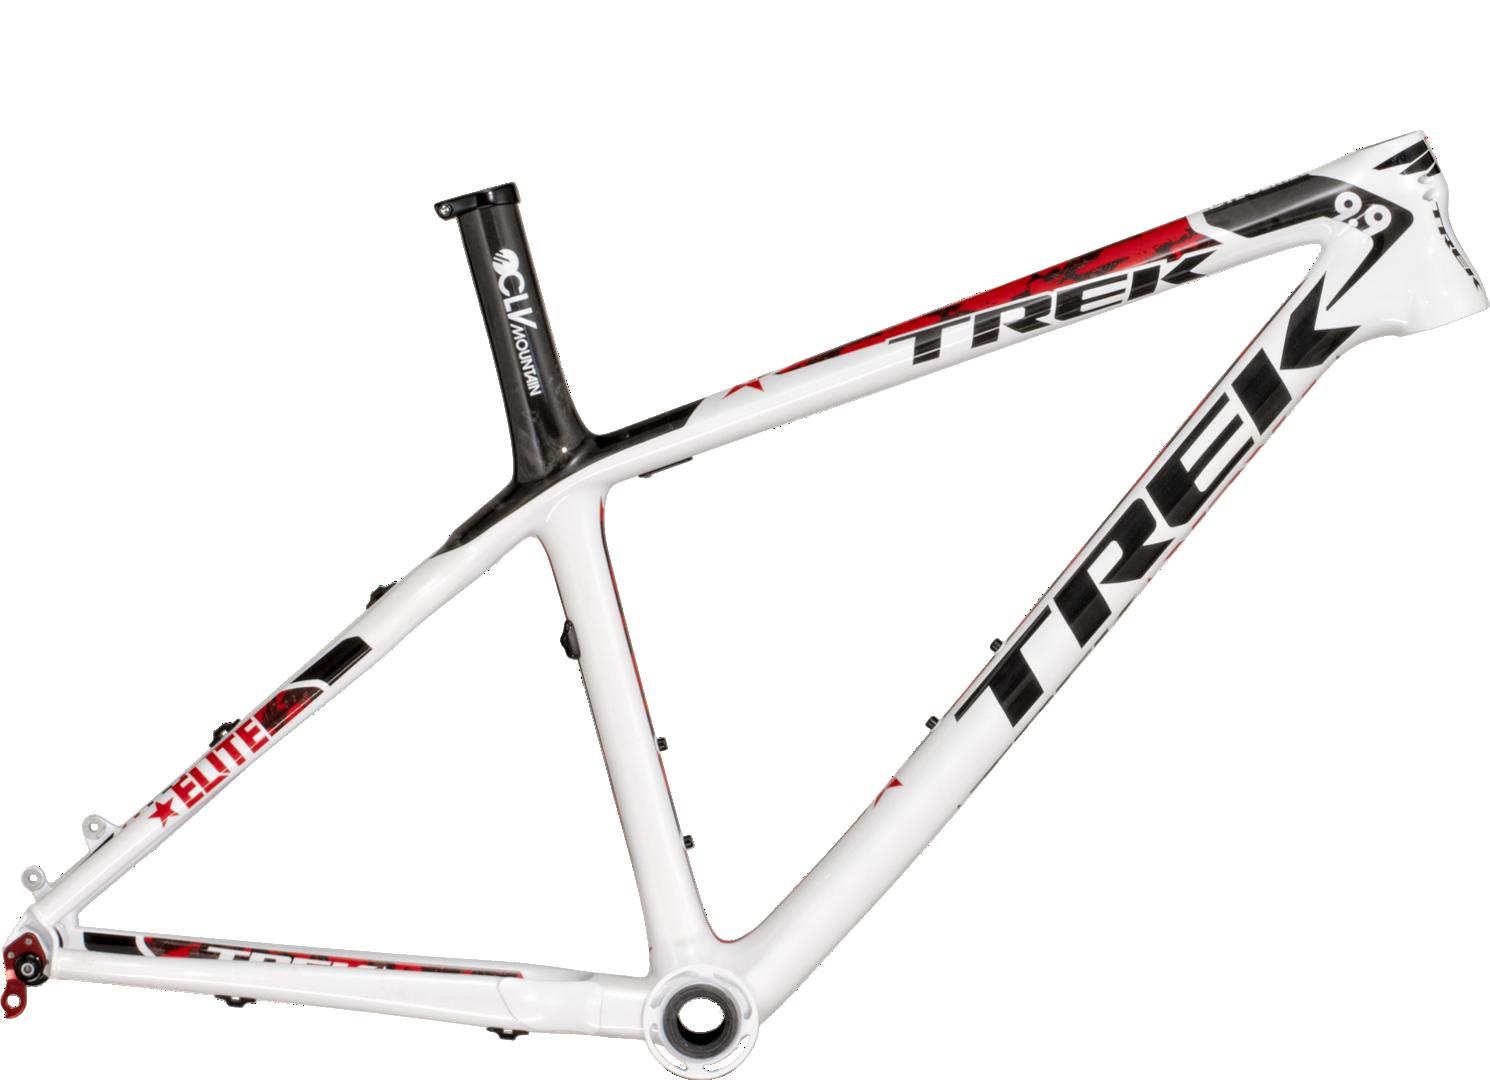 2012 Elite 9.9 SSL Frame - Bike Archive - Trek Bicycle